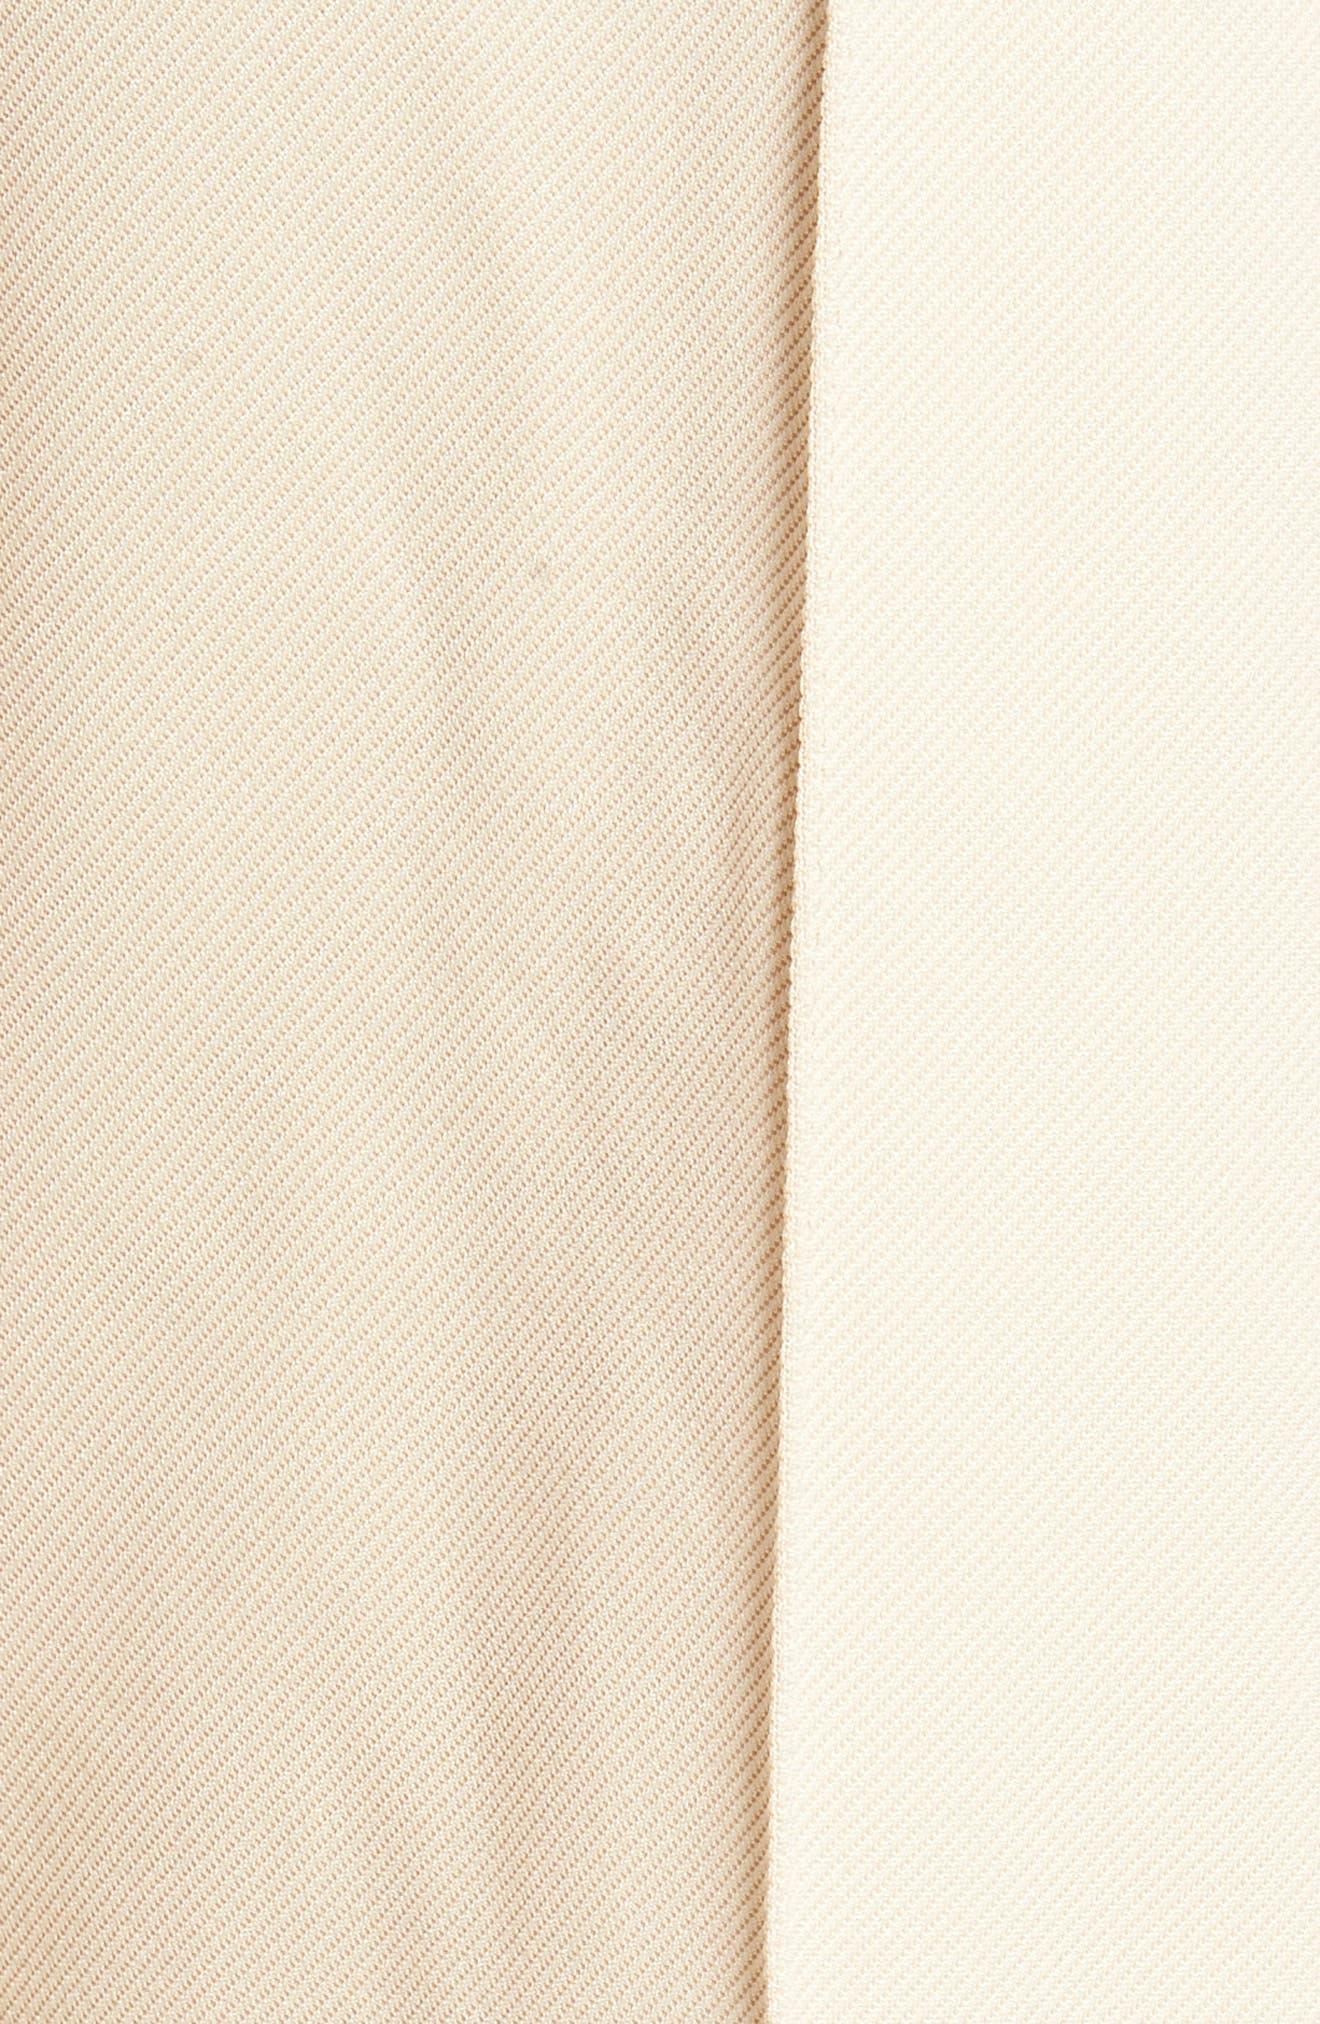 Molveno 2 Pants,                             Alternate thumbnail 5, color,                             250